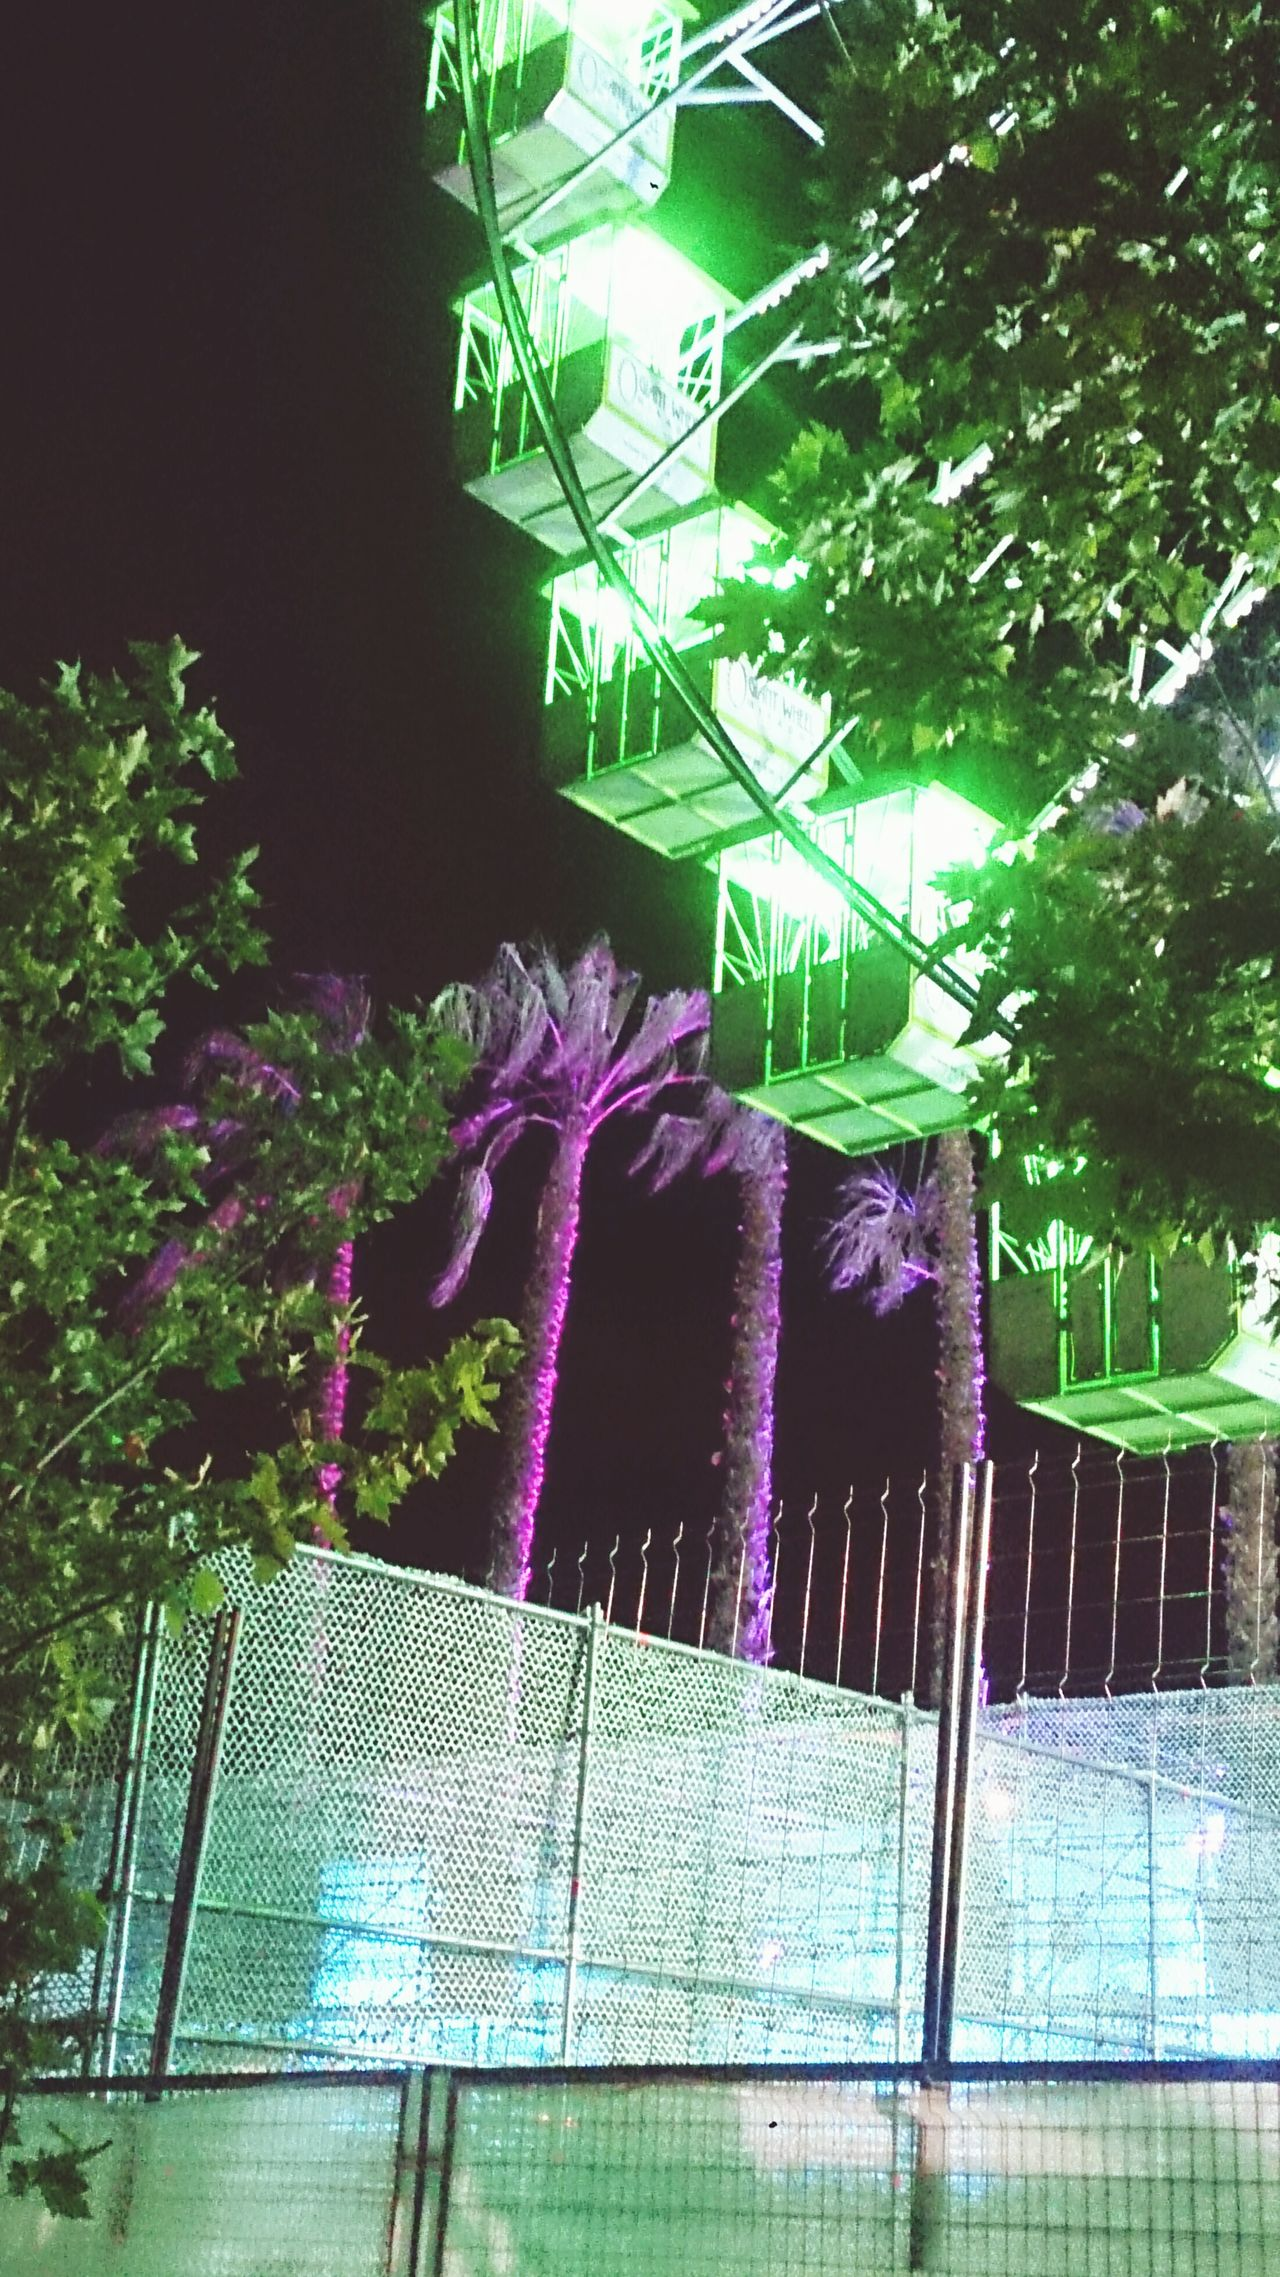 Madcool Palmeras Noria Palm Trees Ferriswheelinthecity🎡🎢 Ferris Wheel Madrid Spain Fesival Festivalesforever